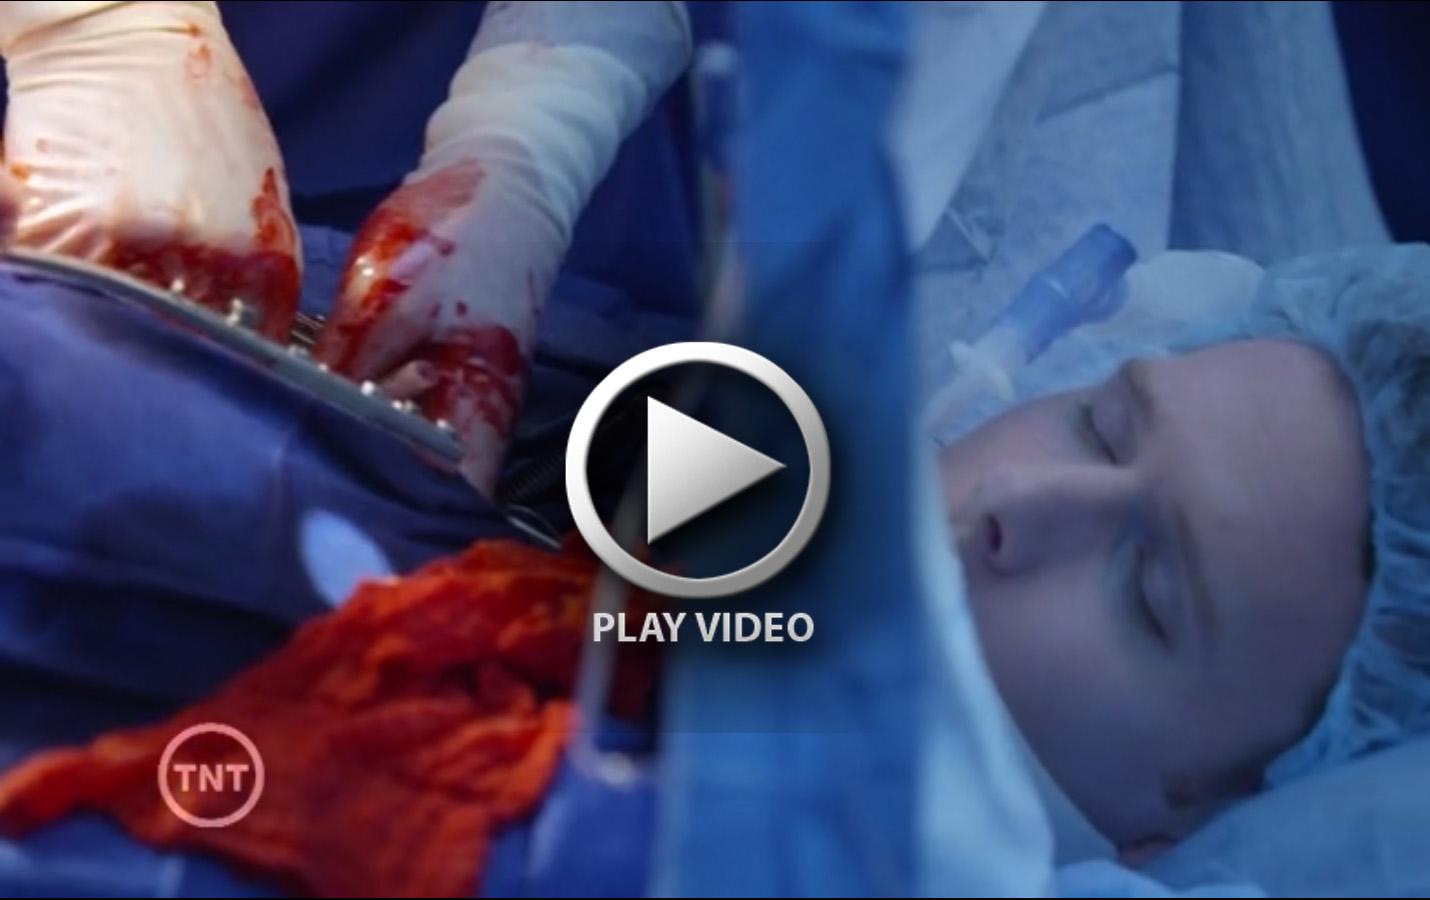 gunshot-to-head-organ-donation-heart-transplant-no-eye-protection